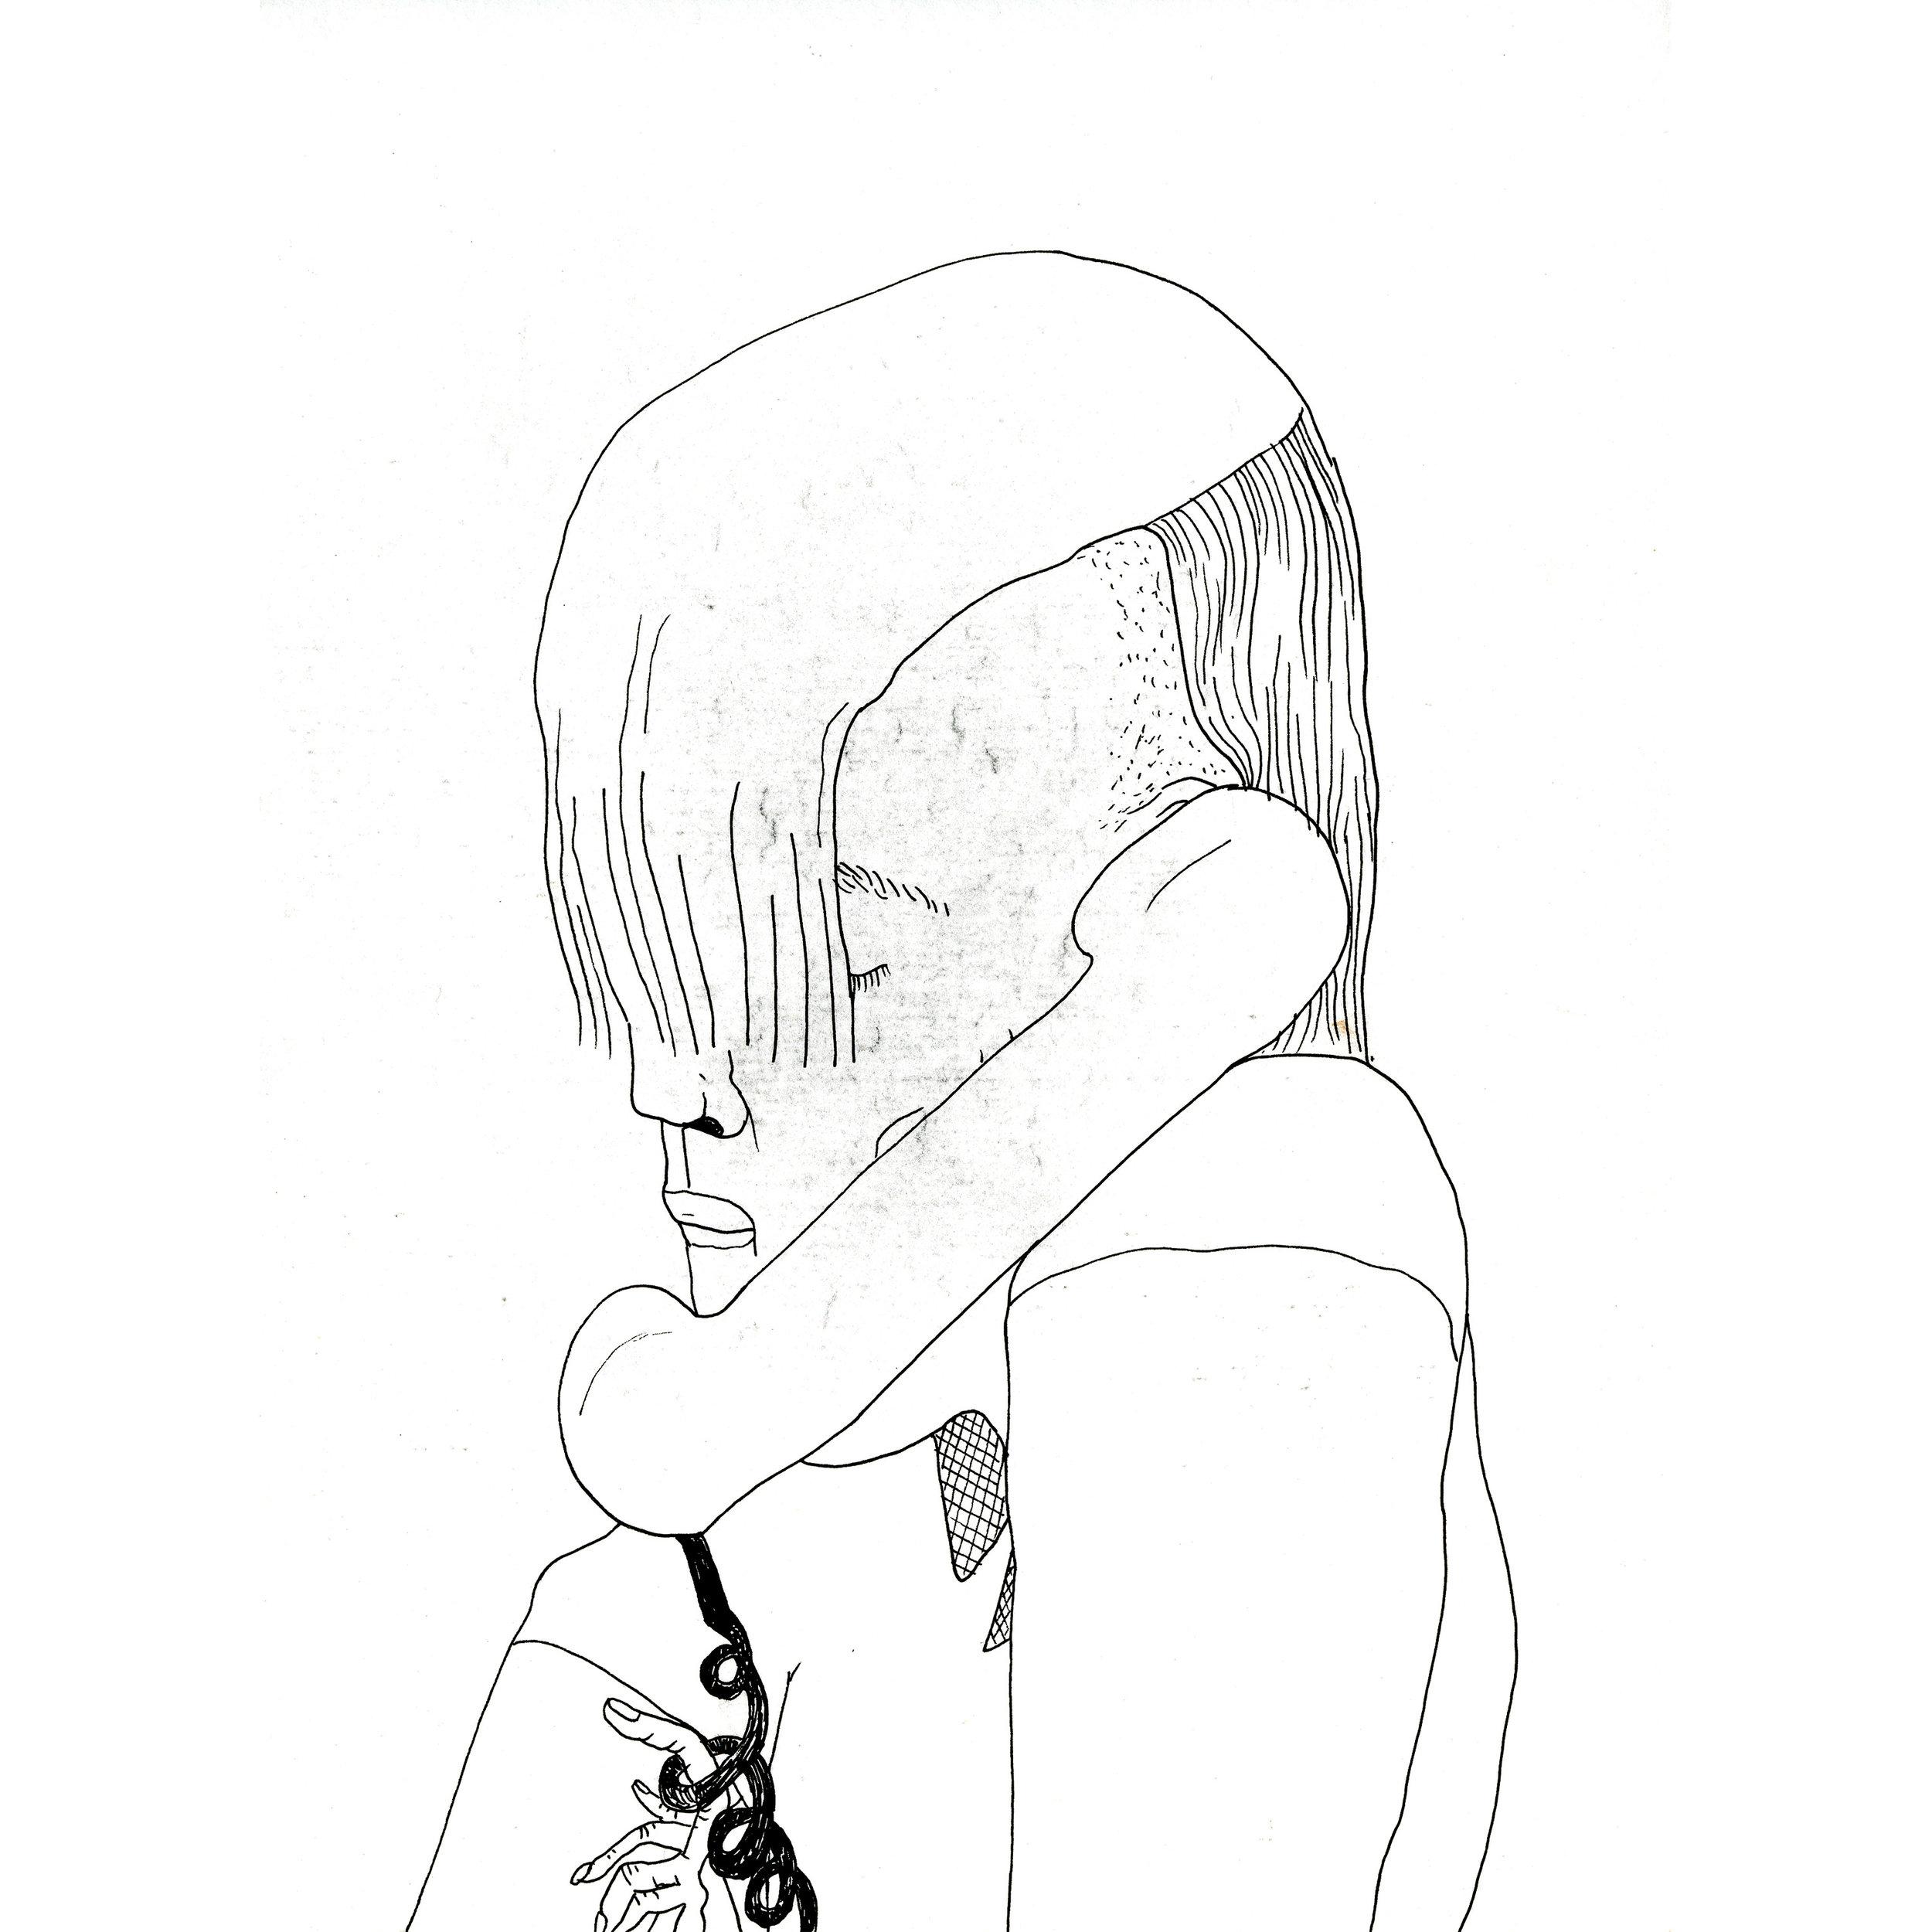 WIVES_The 20 Teens Single Art_Lea Rasovszky.jpg